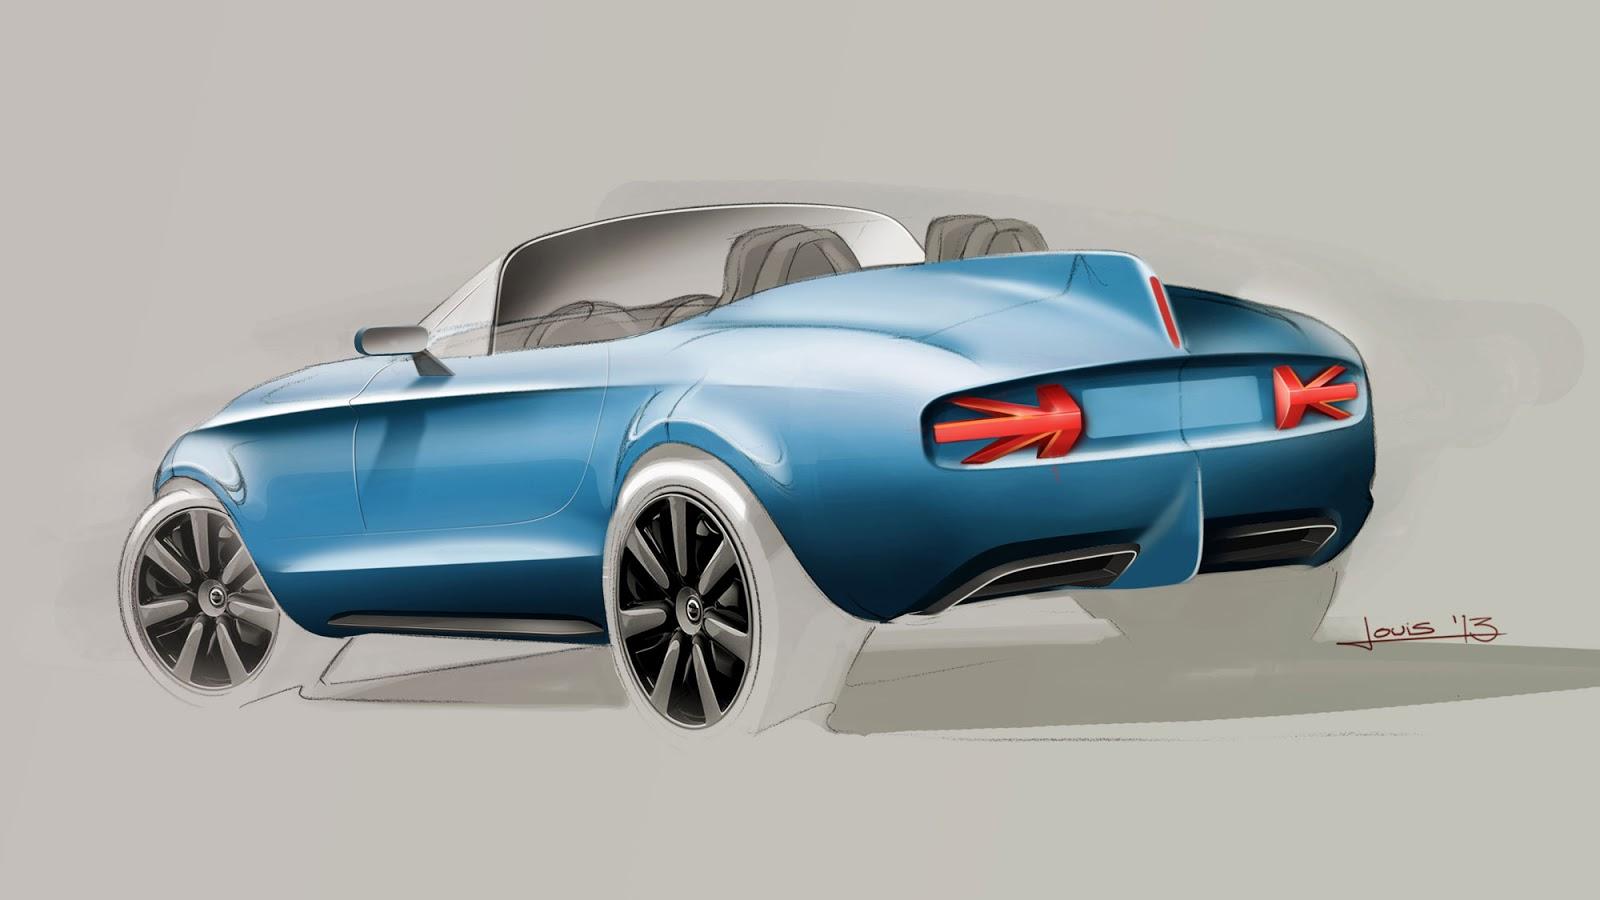 Mini Vision Superleggera rear view sketch by Louis de Fabribeckers